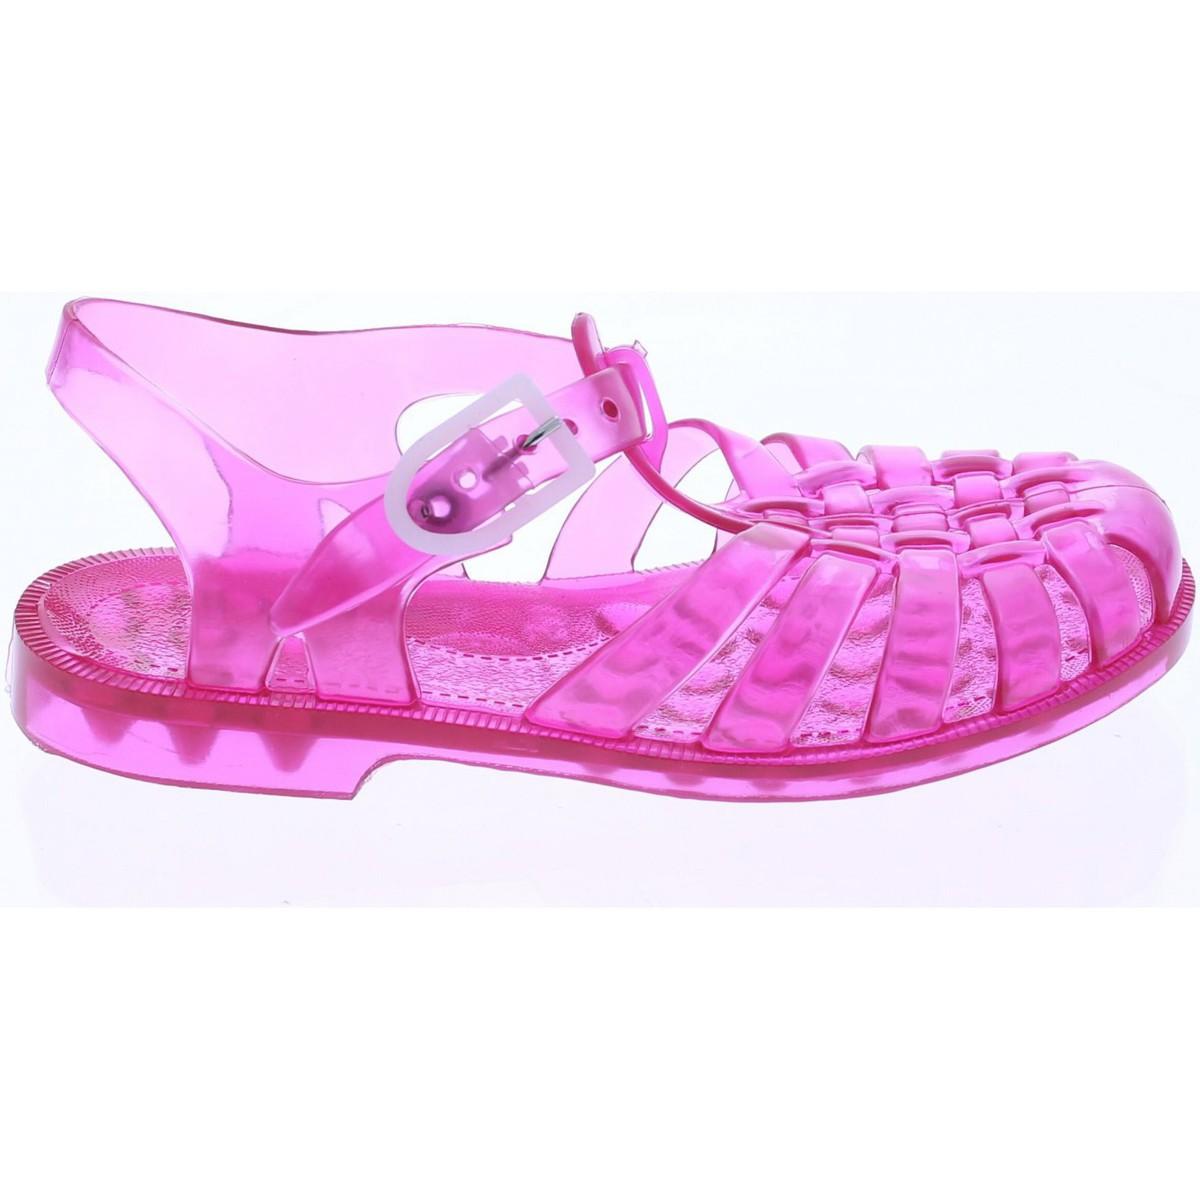 chaussures aquatiques m duse sandales fille en plastique rose groseille rose chaussures enfant. Black Bedroom Furniture Sets. Home Design Ideas